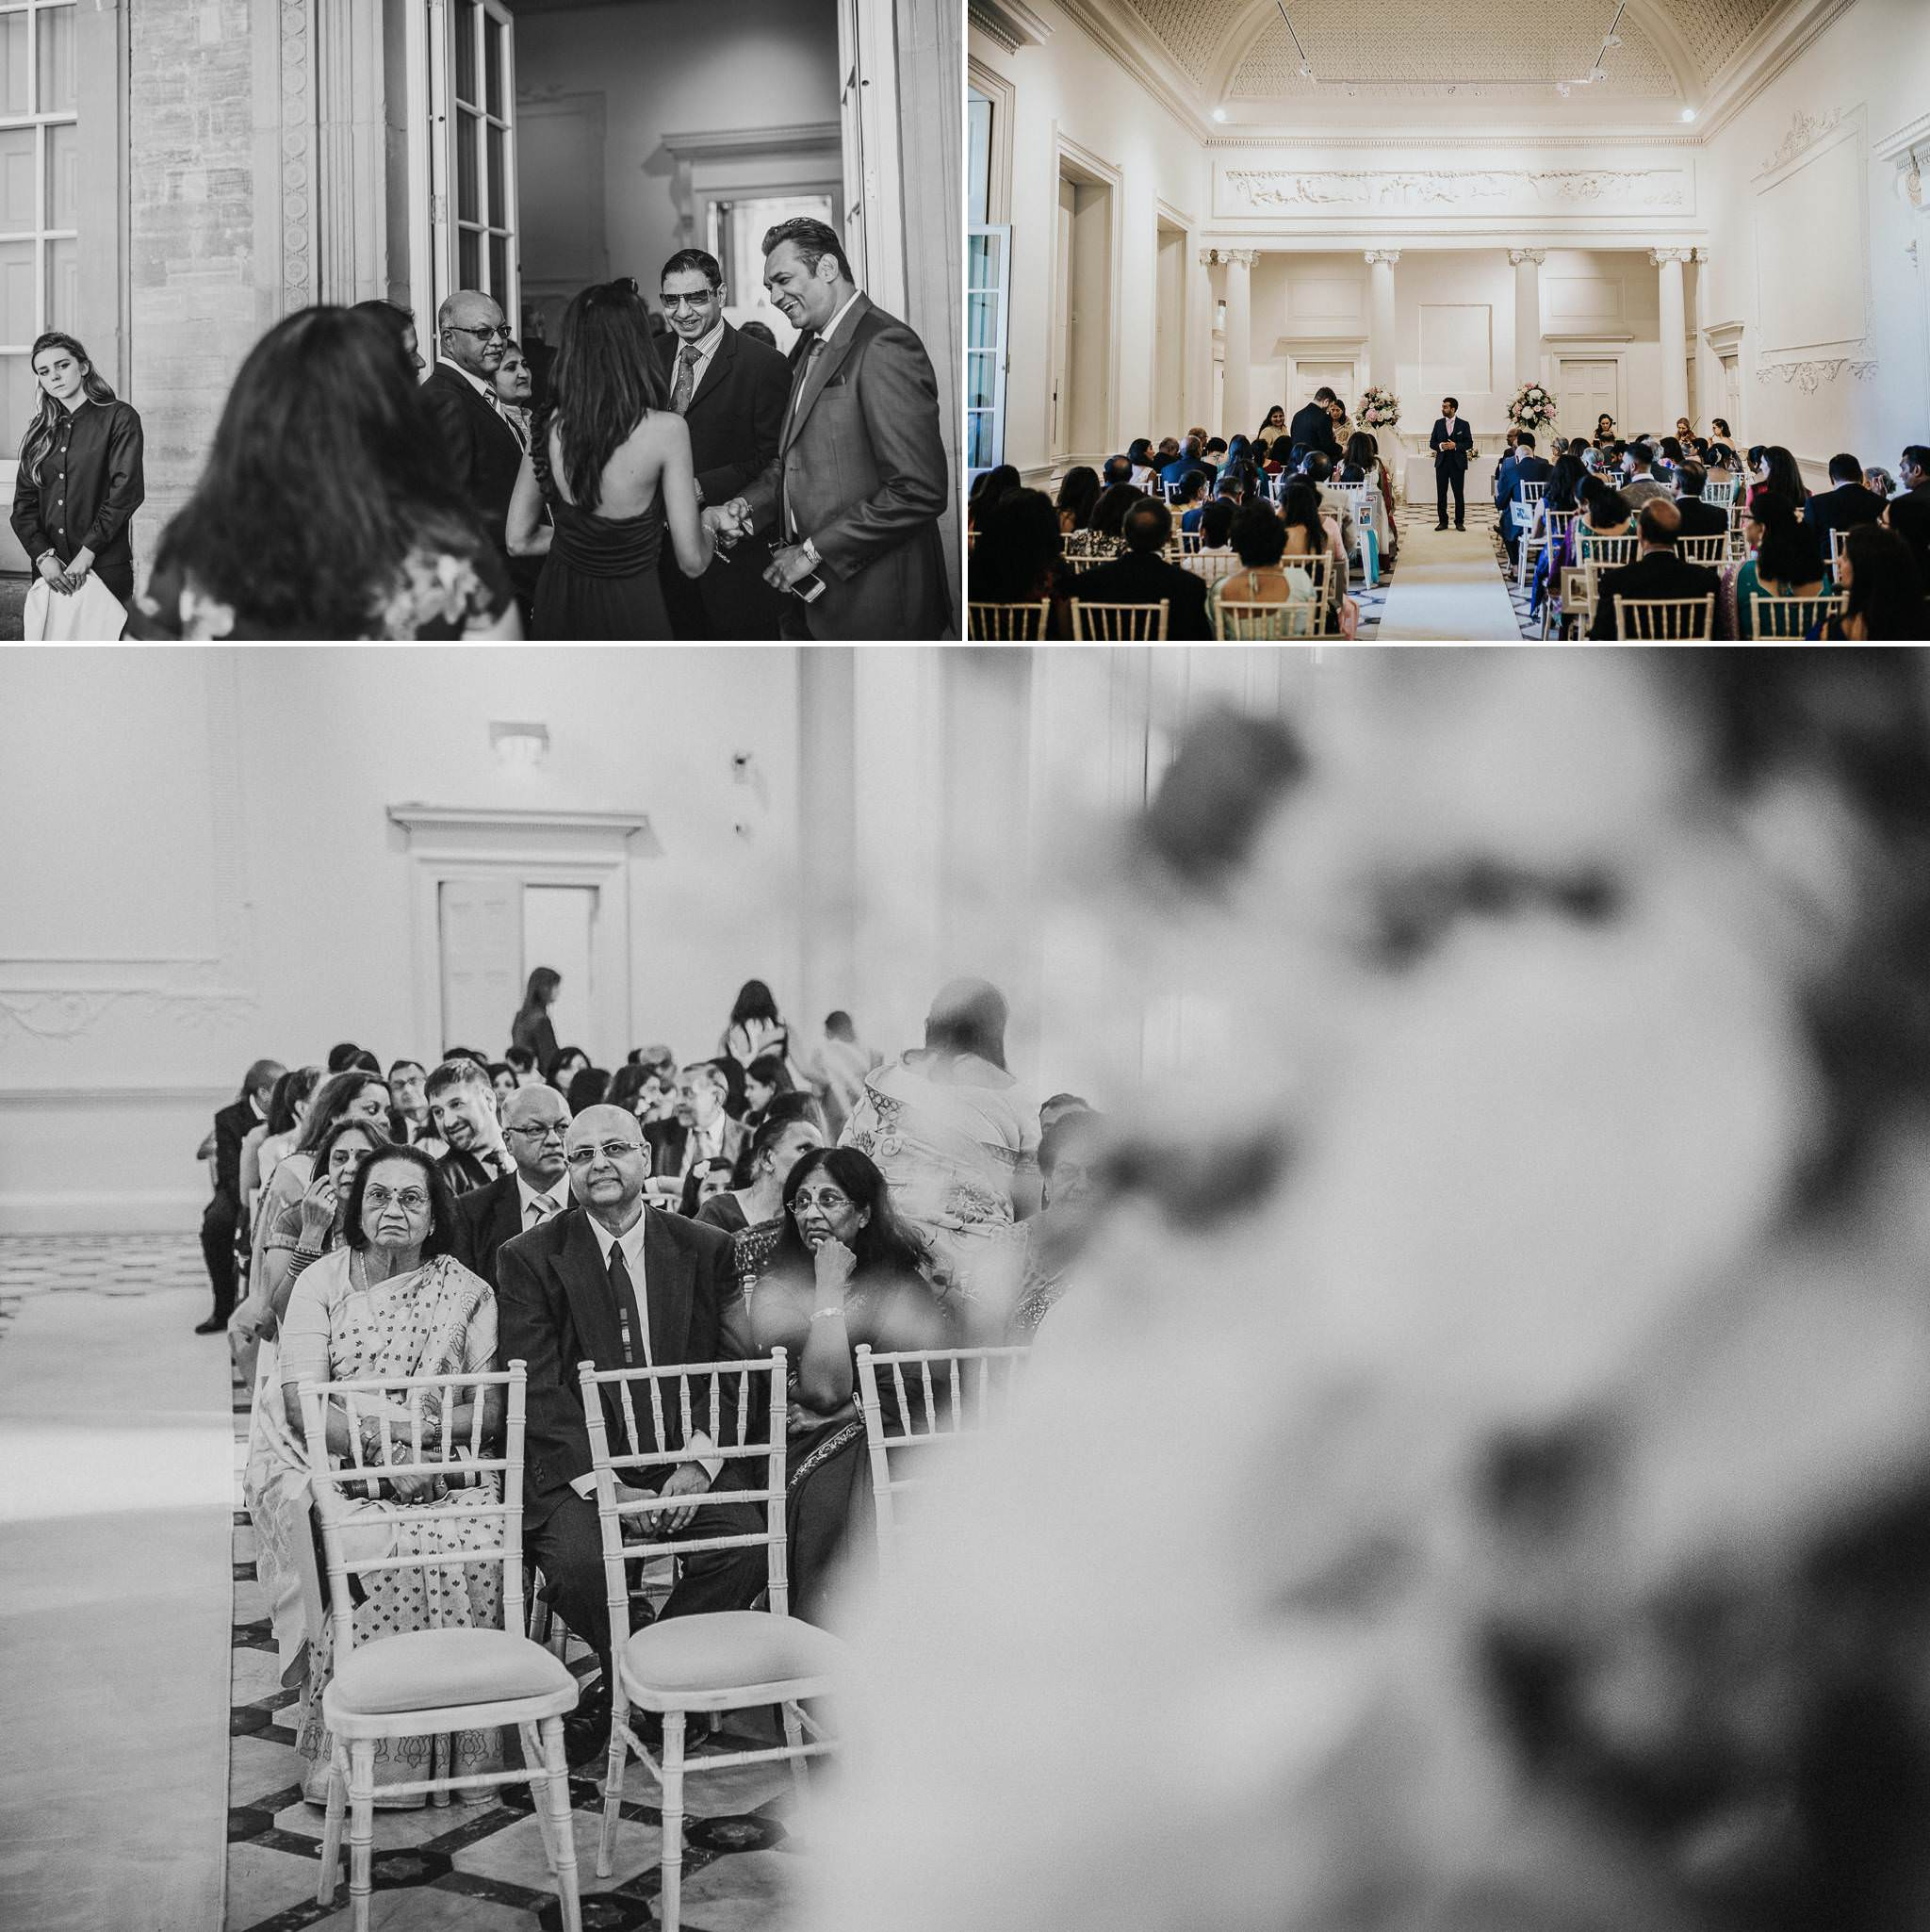 compton-verney-wedding-photos 10.jpg